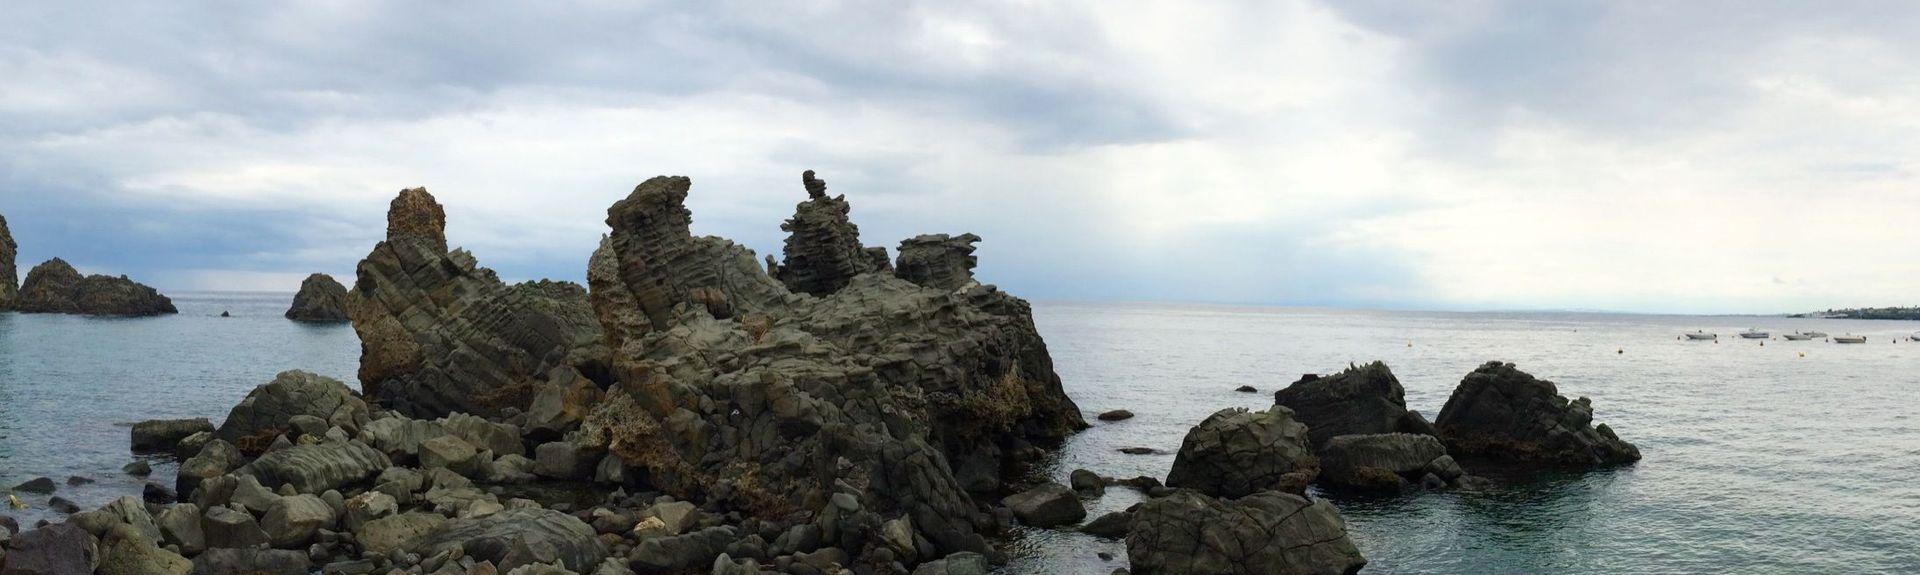 Aci Trezza, Aci Castello, Sicily, Italy